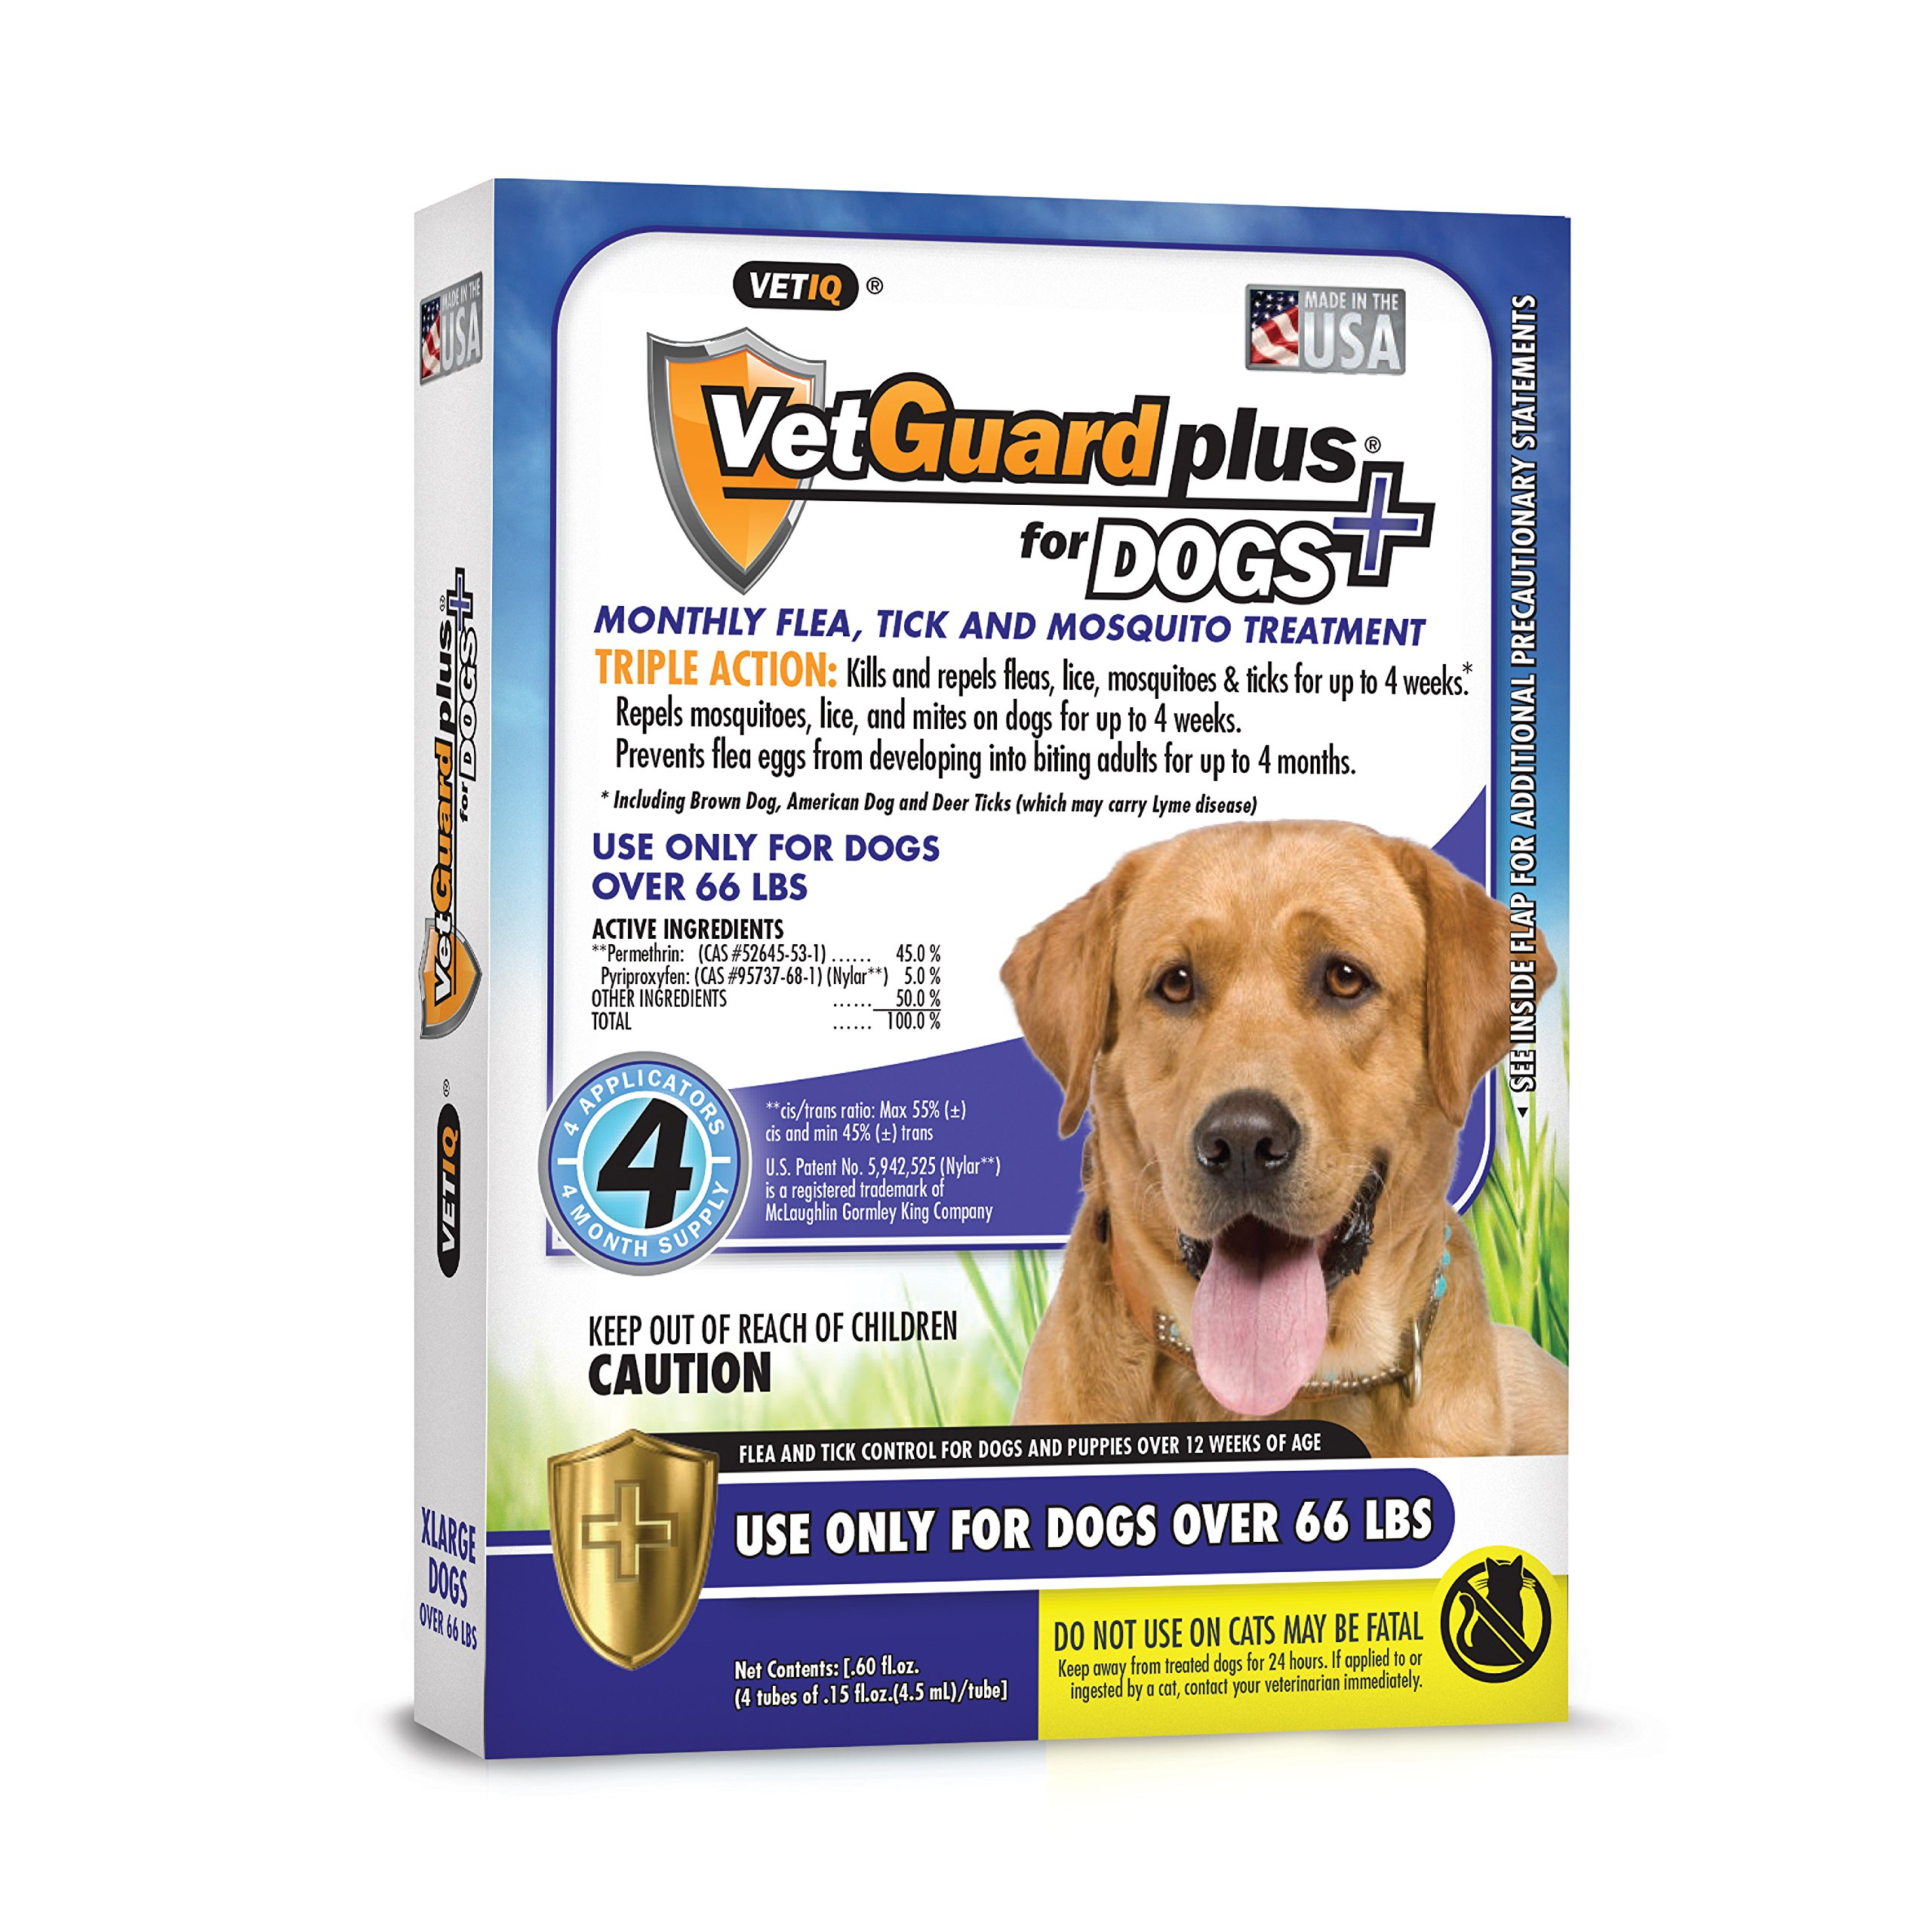 VetGuard Plus Flea & Tick Treatment X-Large Dogs, Over 66 lbs, 4 Month Supply